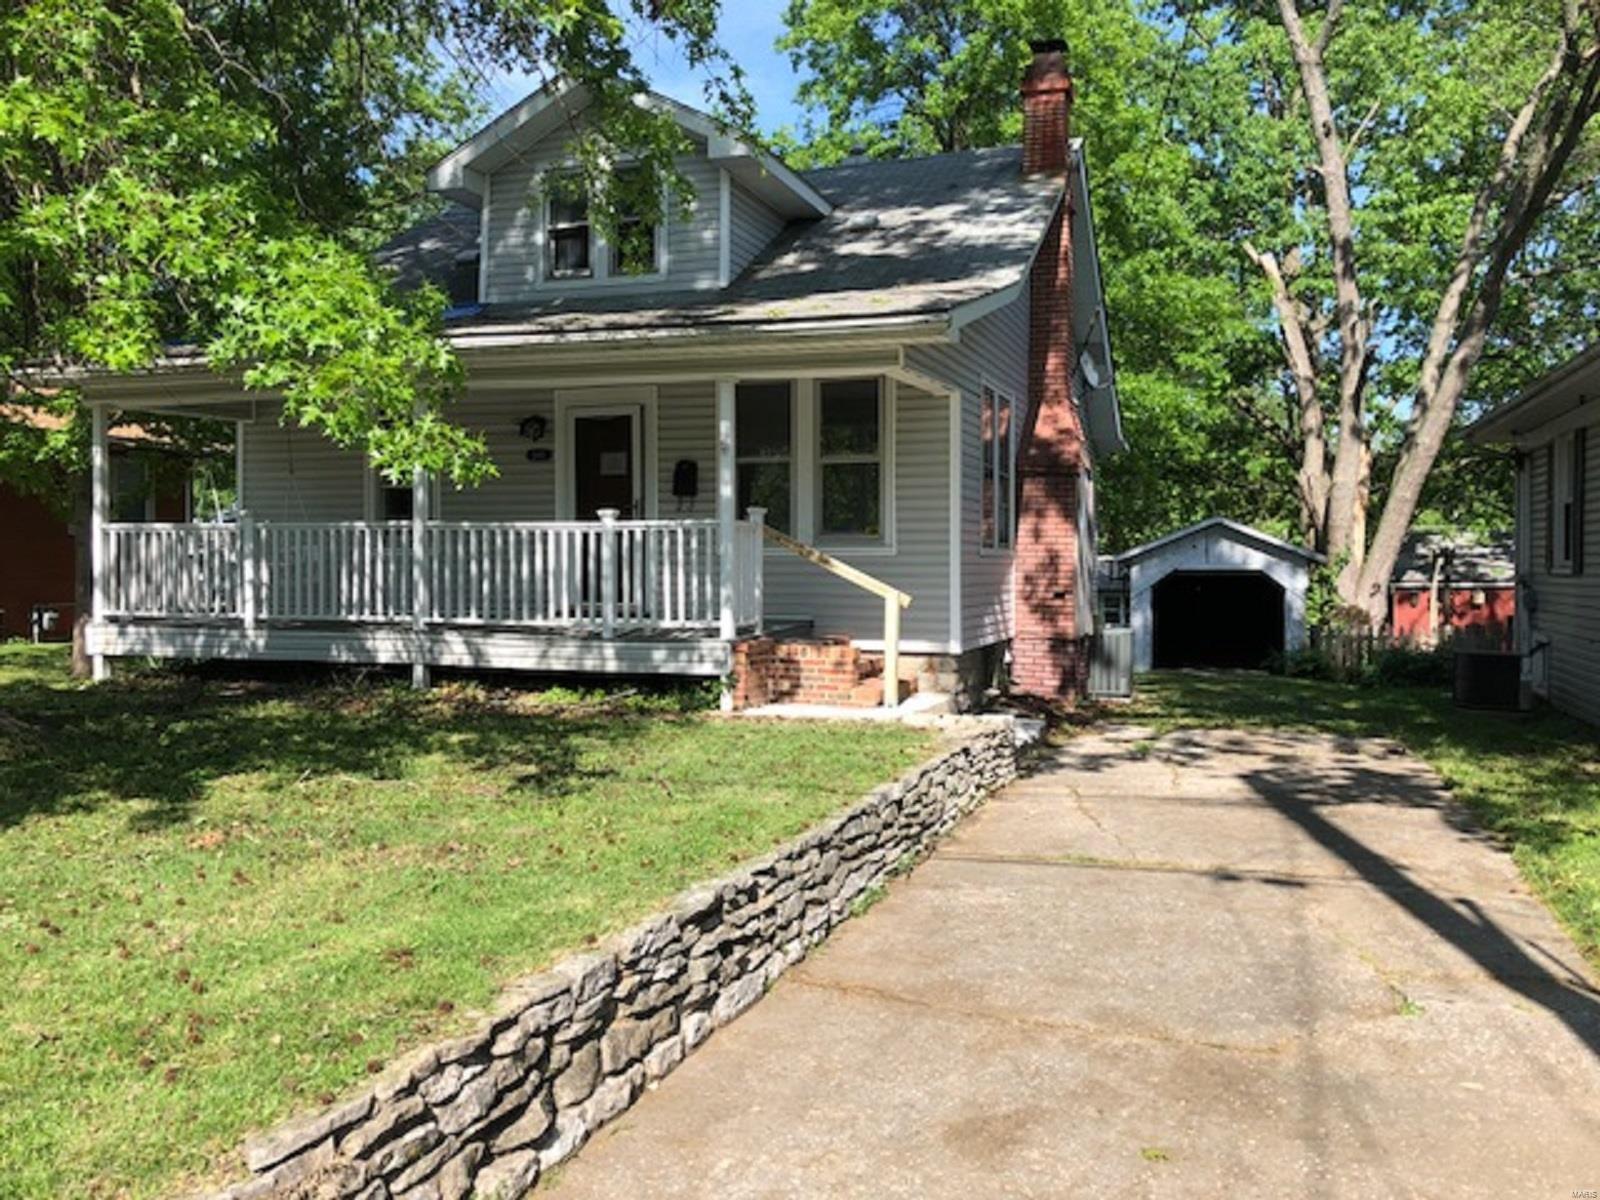 2411 Kohler St, Alton, IL 62002 - Recently Sold | Trulia